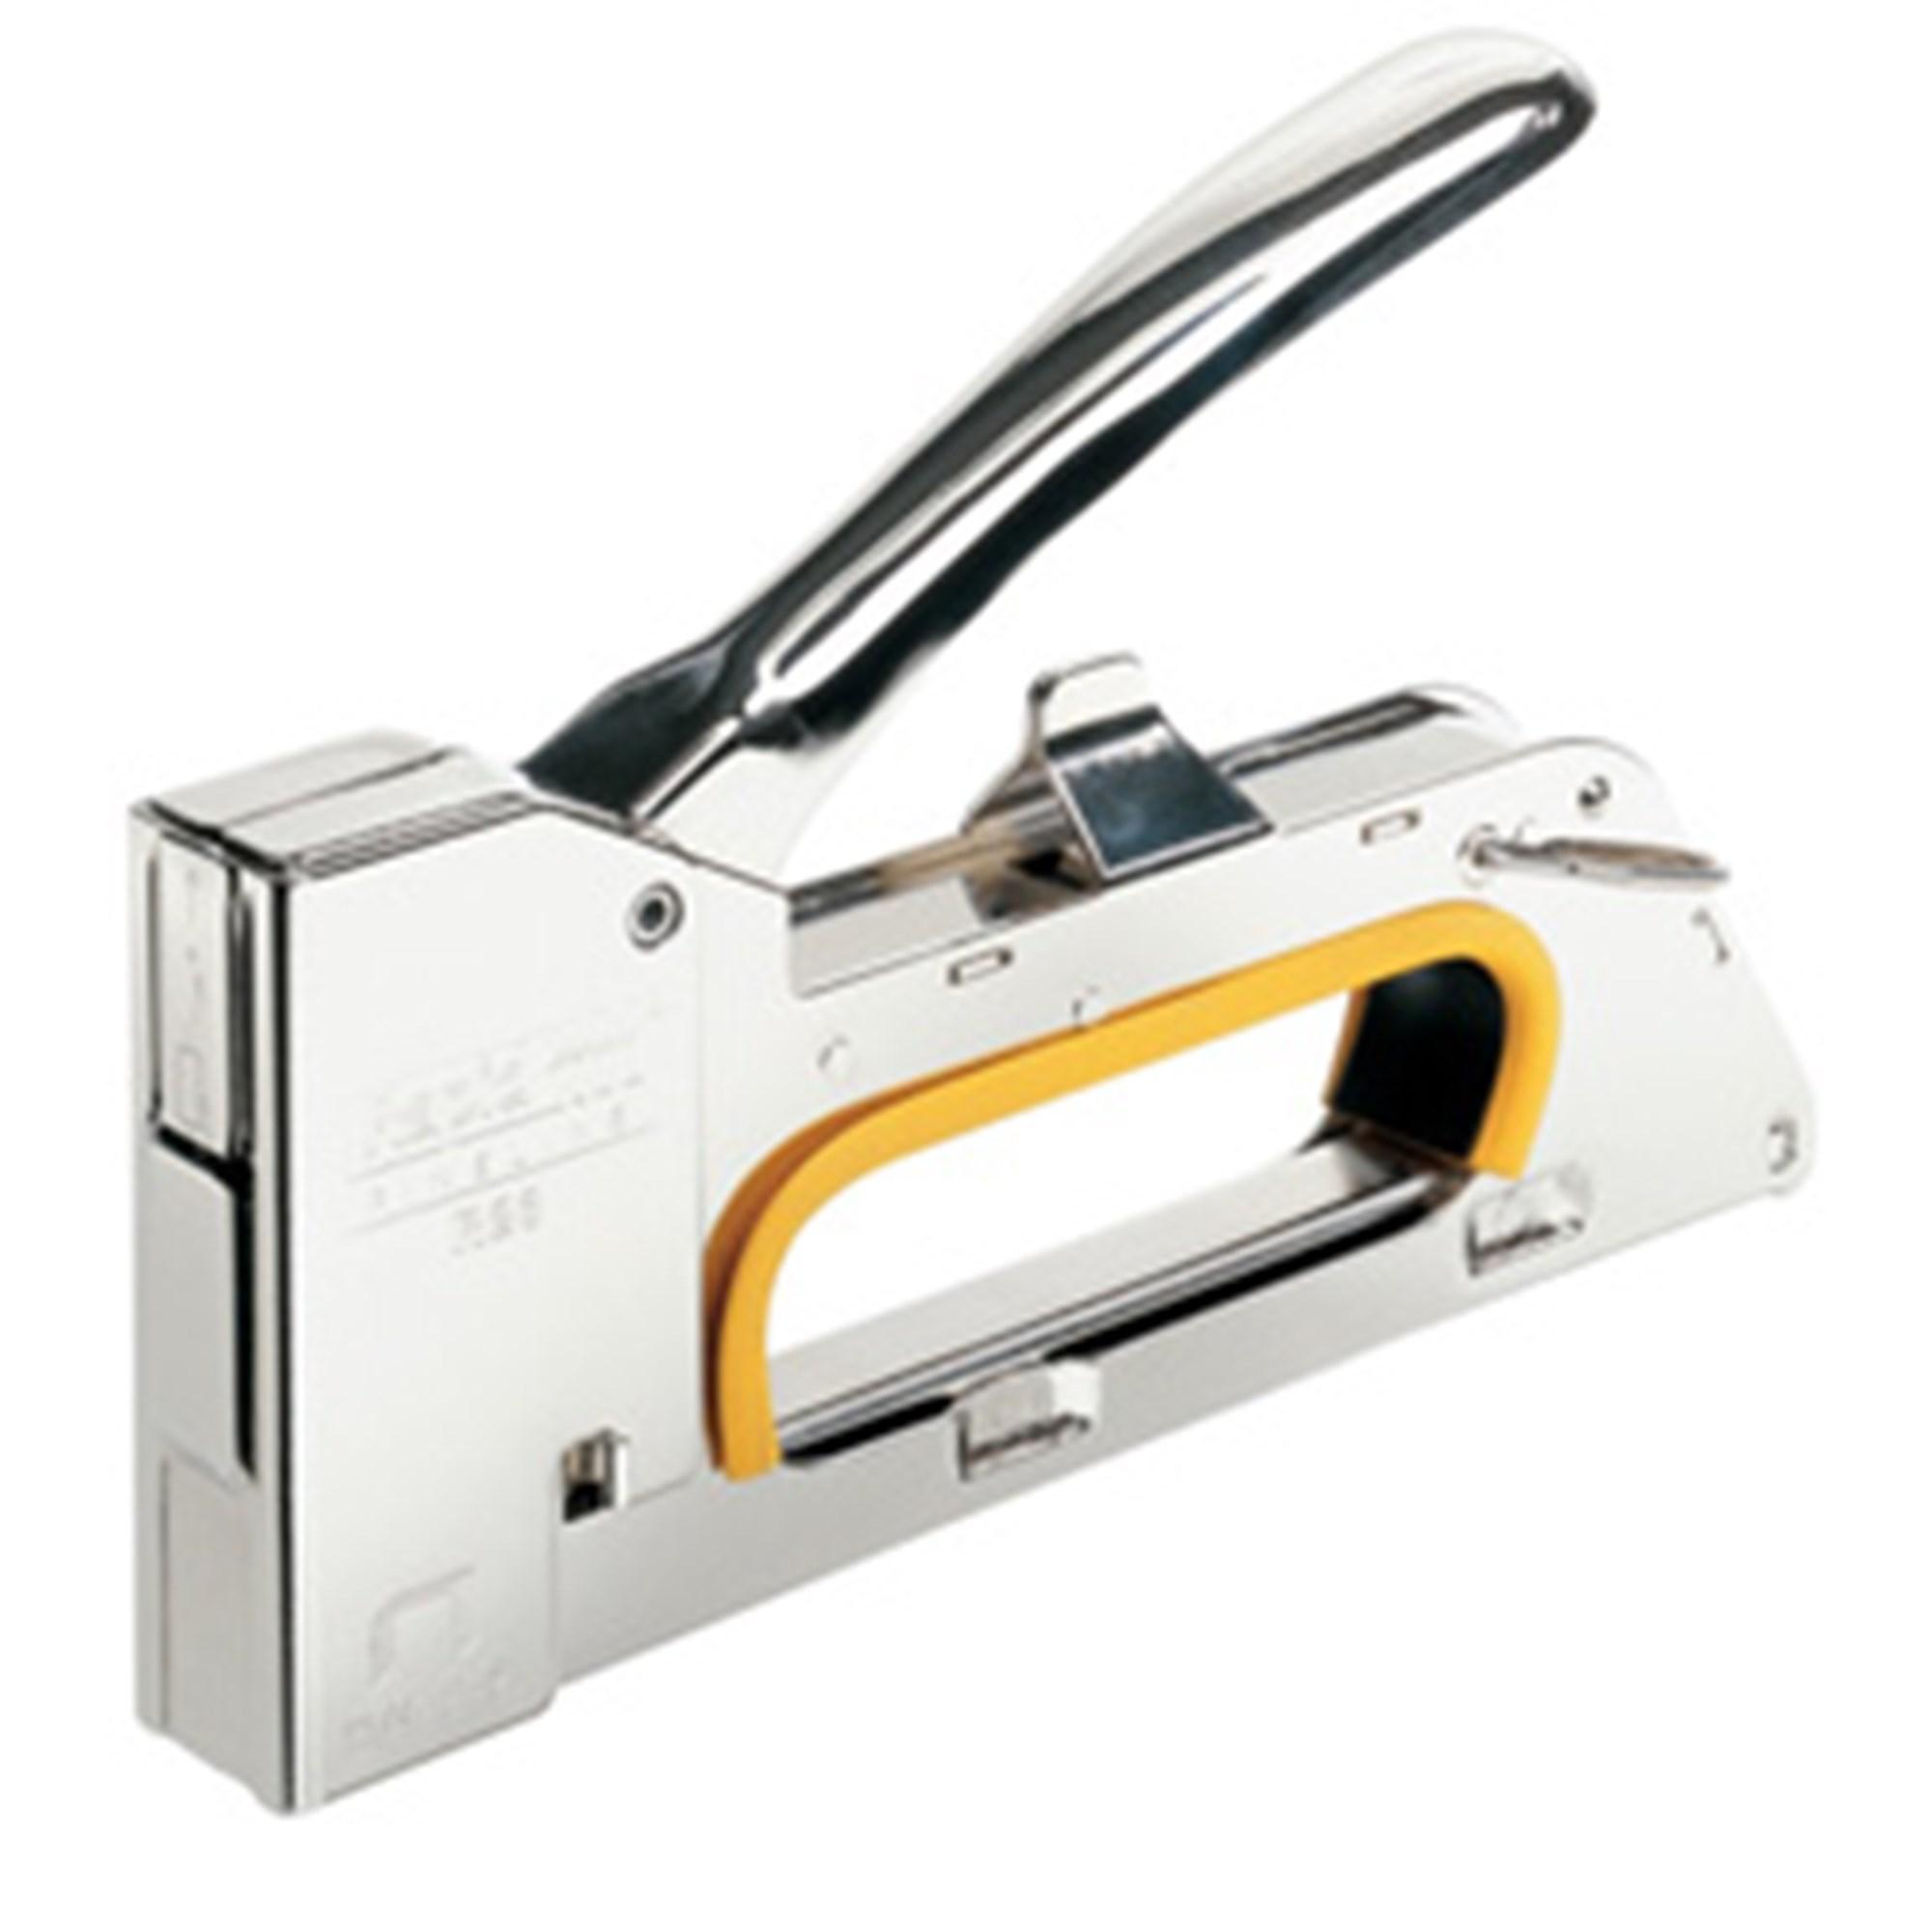 Image of   Hæftepistol R23E prof stål blister